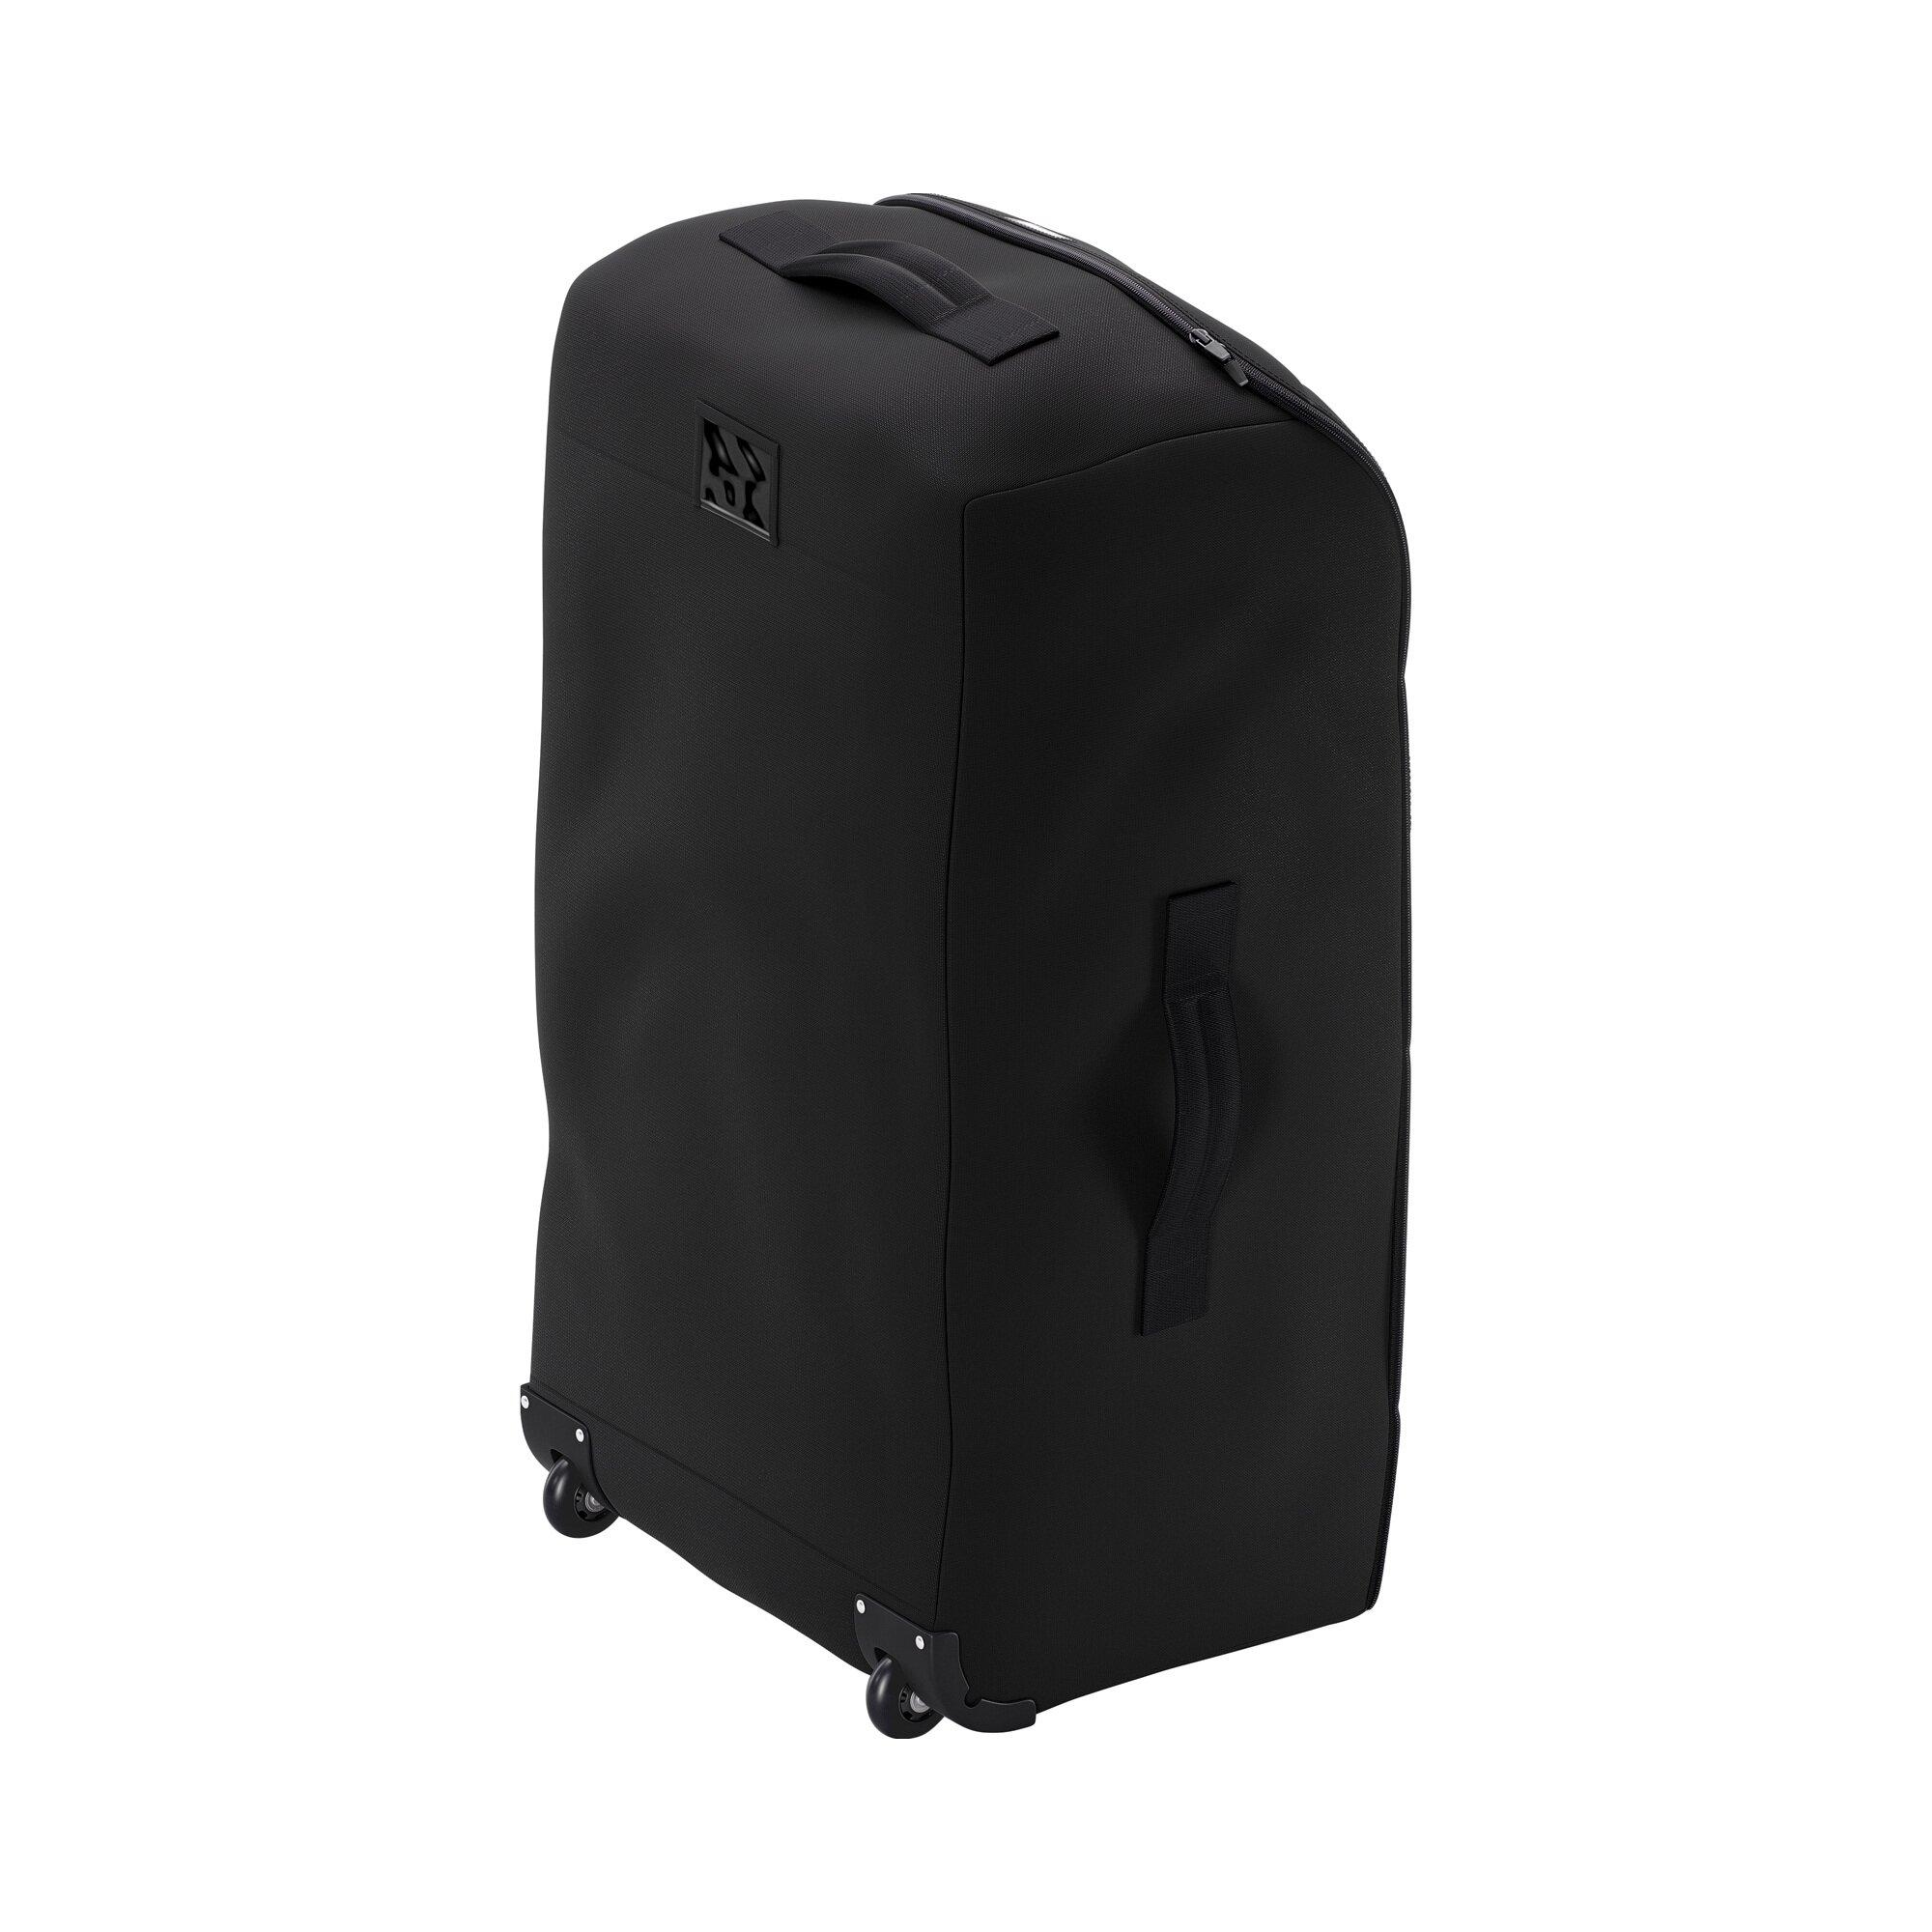 thule-transporttasche-travel-bag-fur-sleek-schwarz